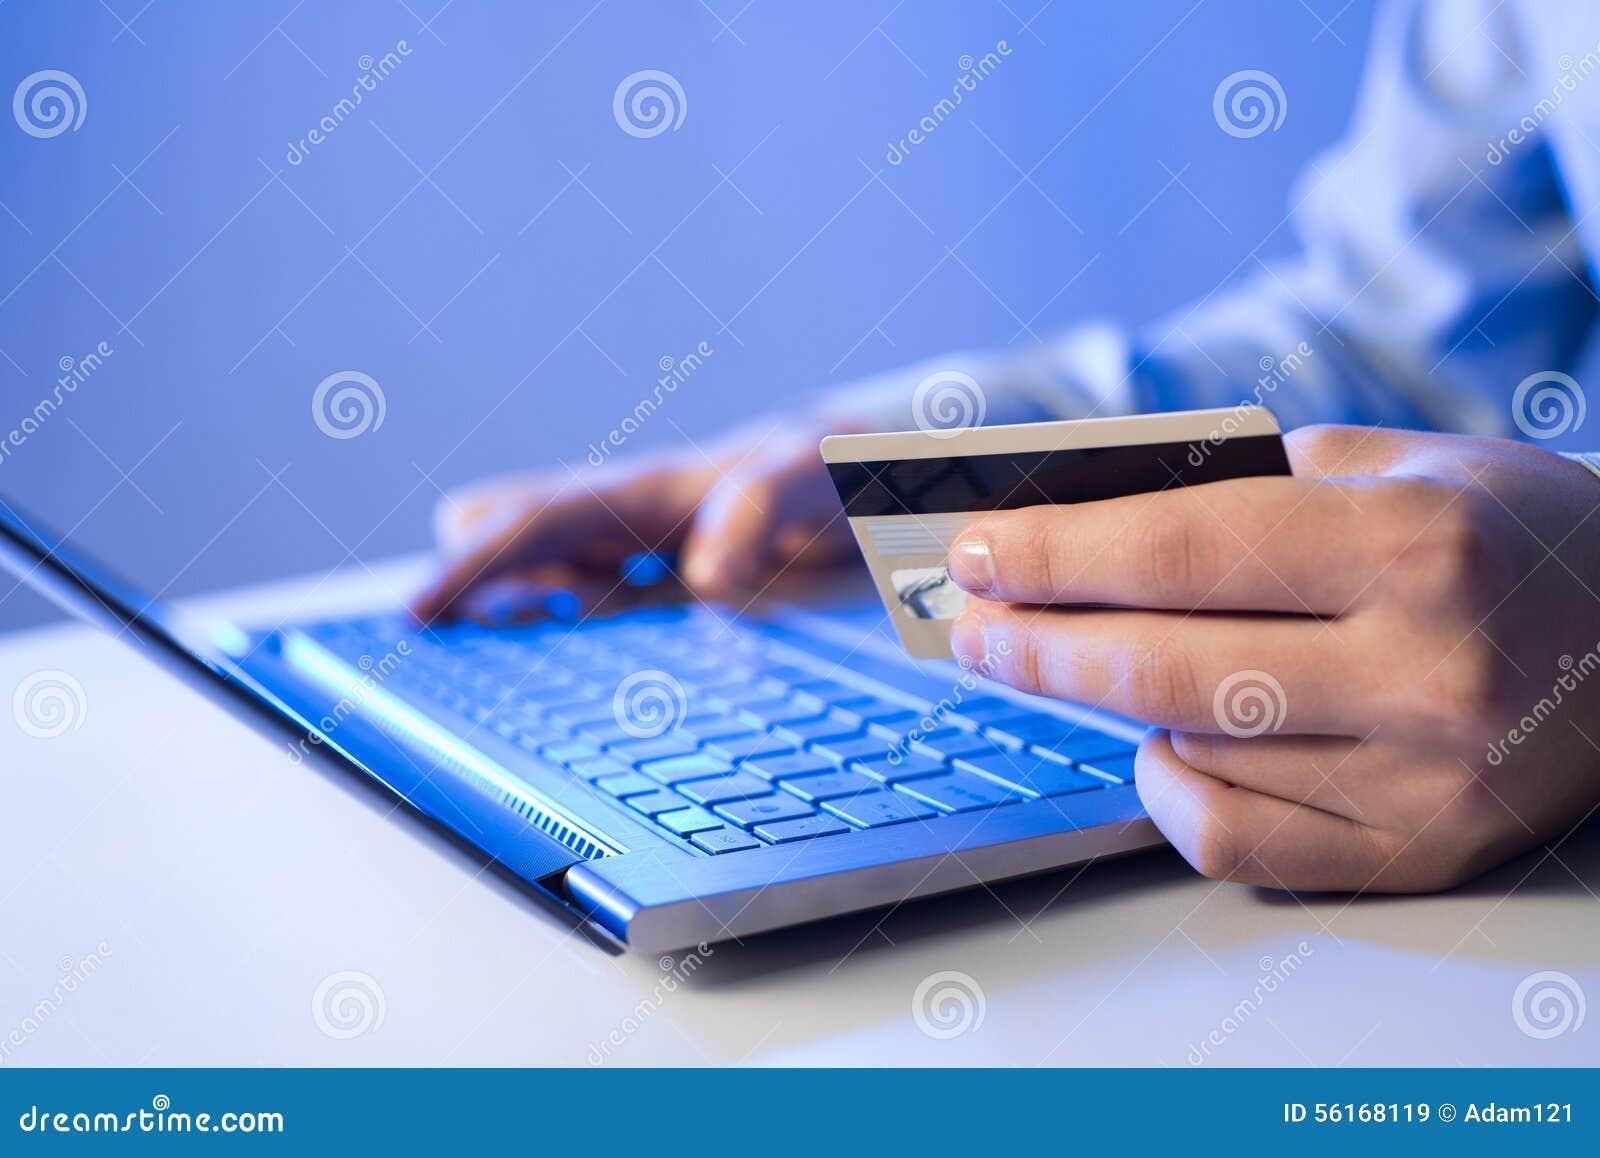 online payment stock photo image 56168119. Black Bedroom Furniture Sets. Home Design Ideas